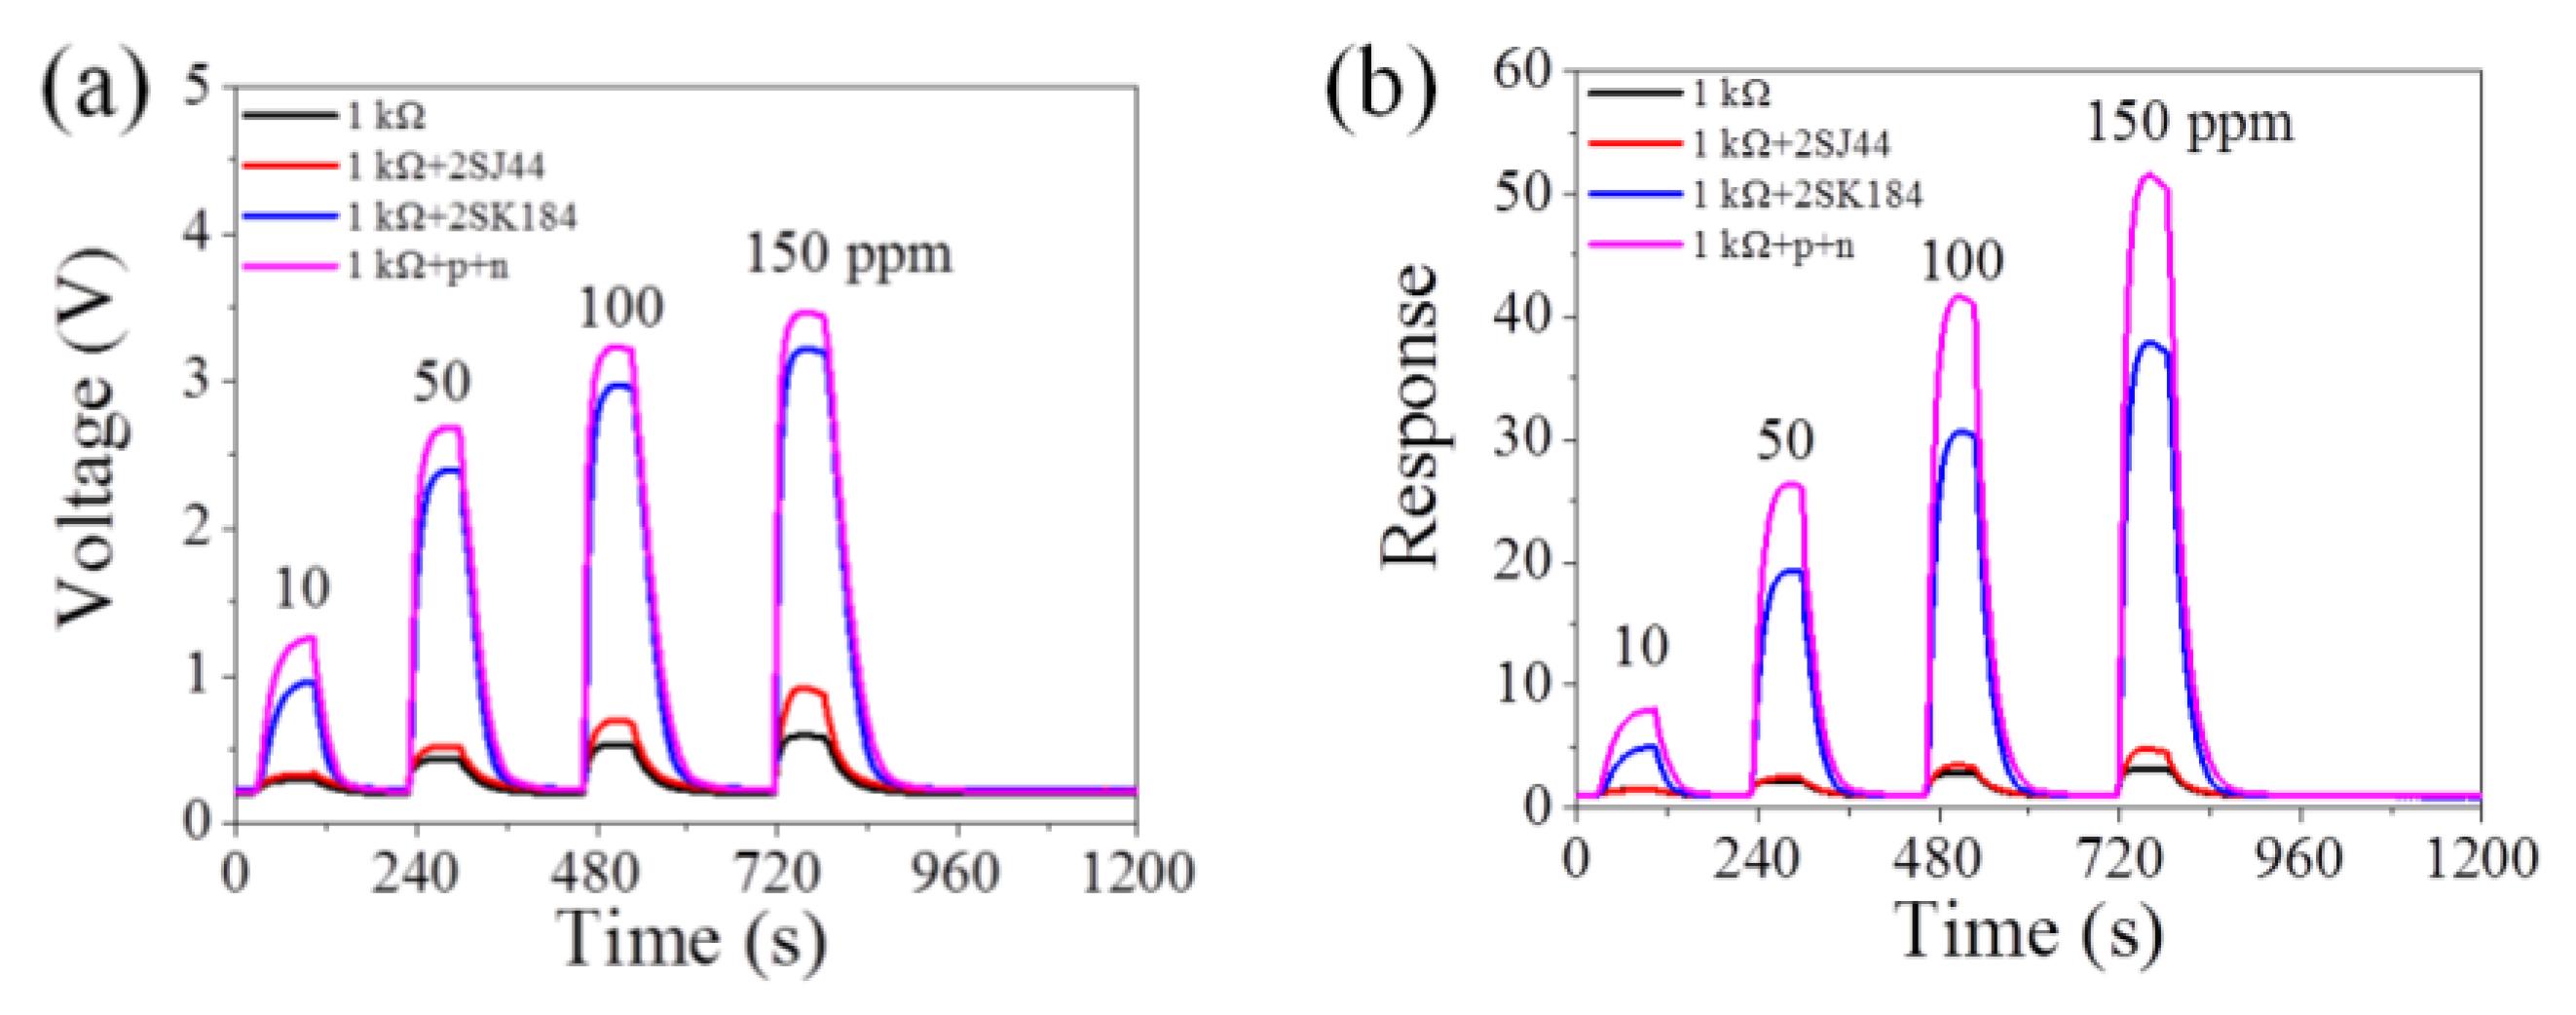 Sensors Free Full Text Coupling P N Field Effect Transistor Low Battery Indicator Freecircuits 18 00787 G006